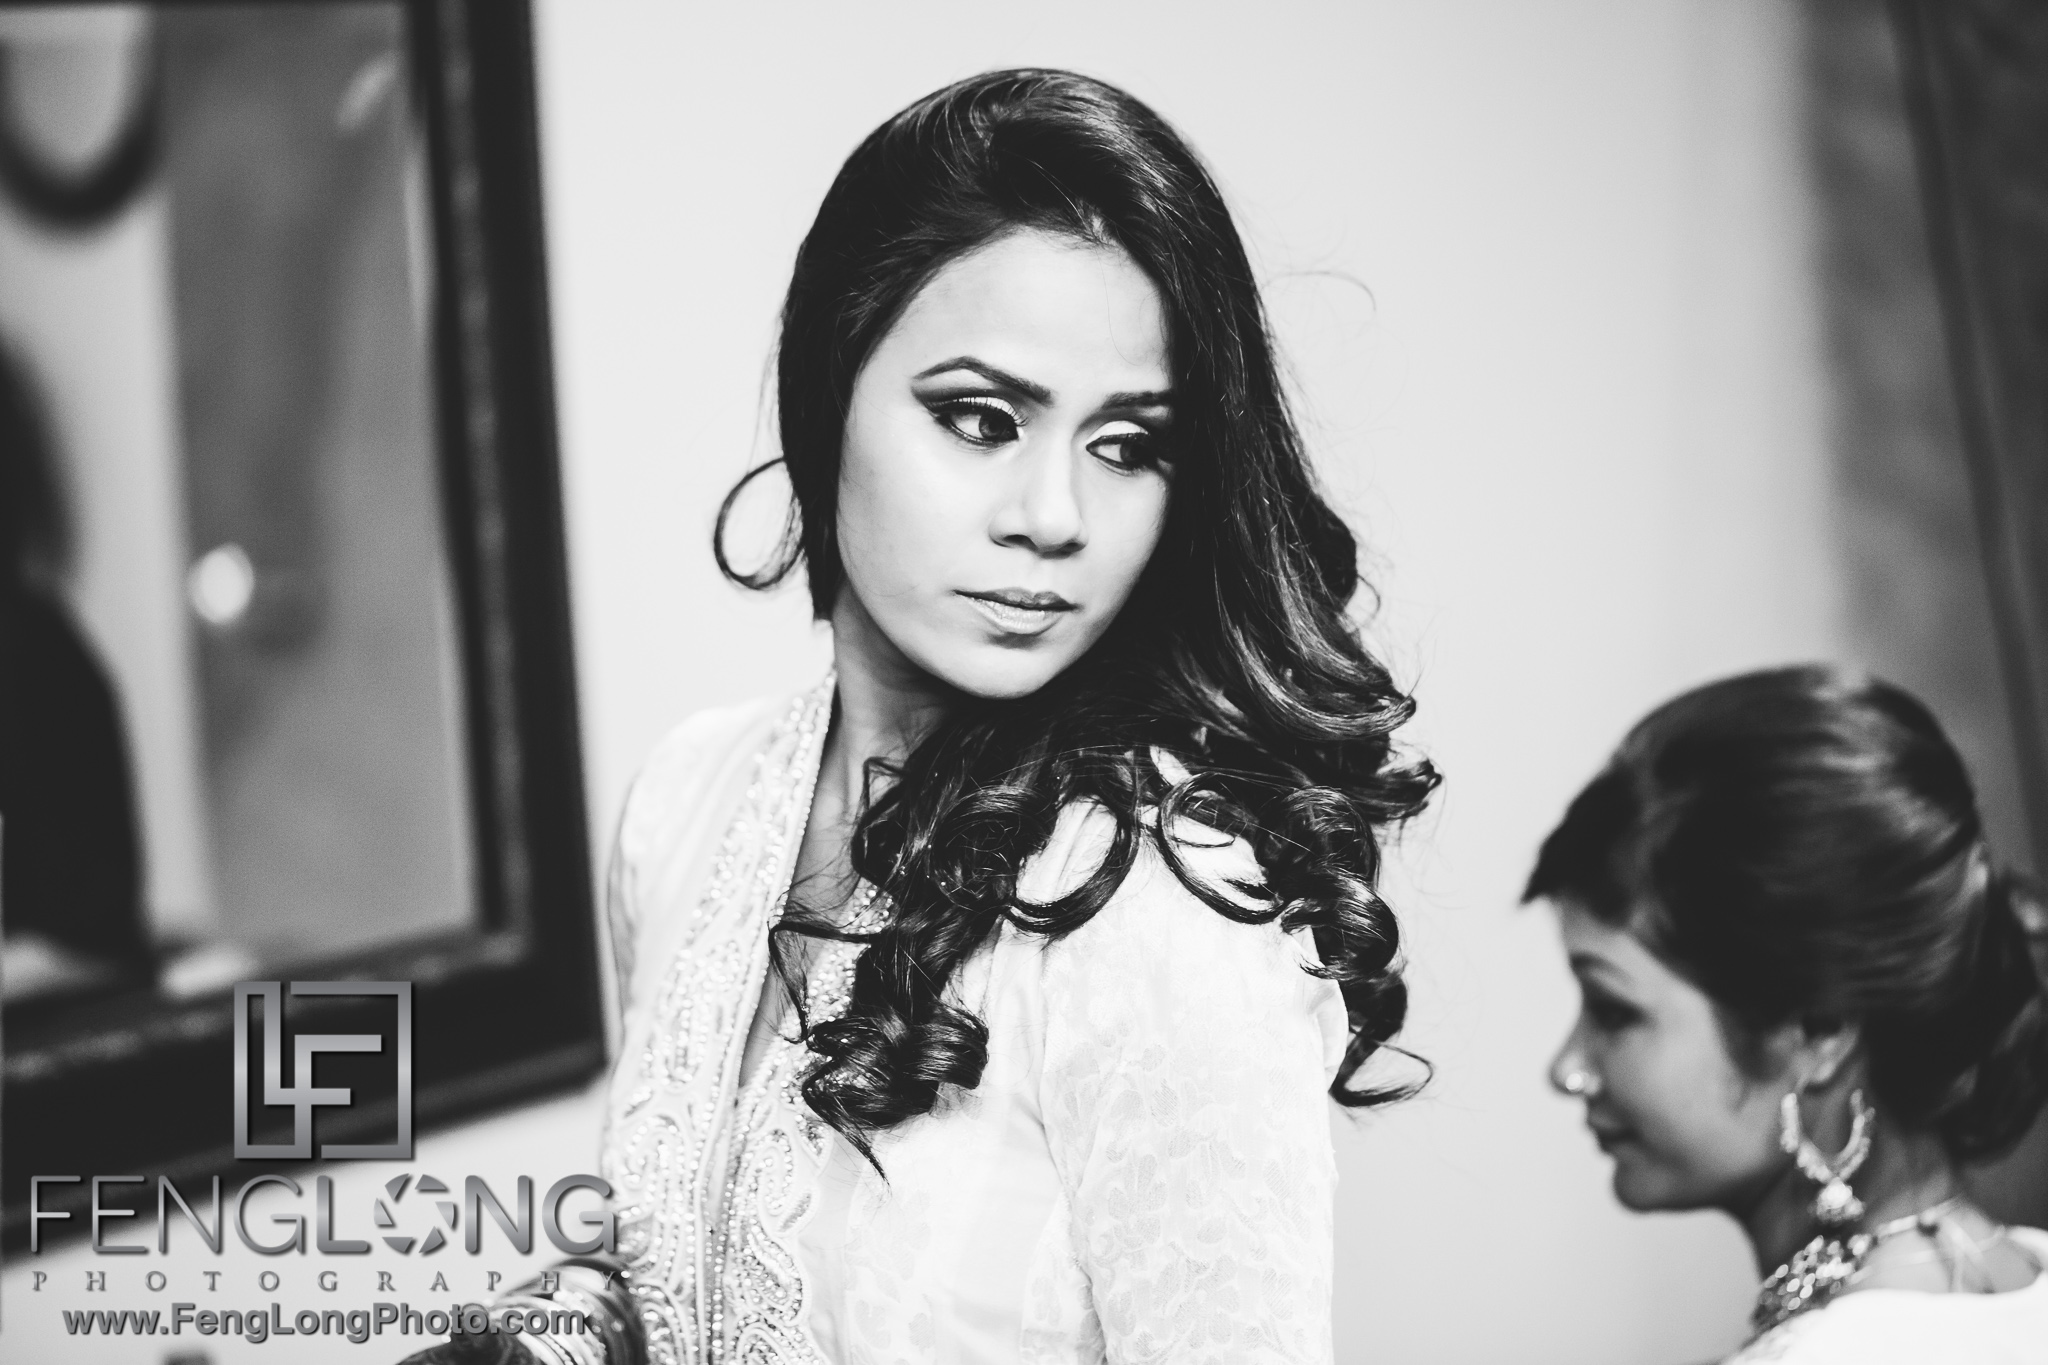 atlanta-bengali-indian-wedding-engagement-327930